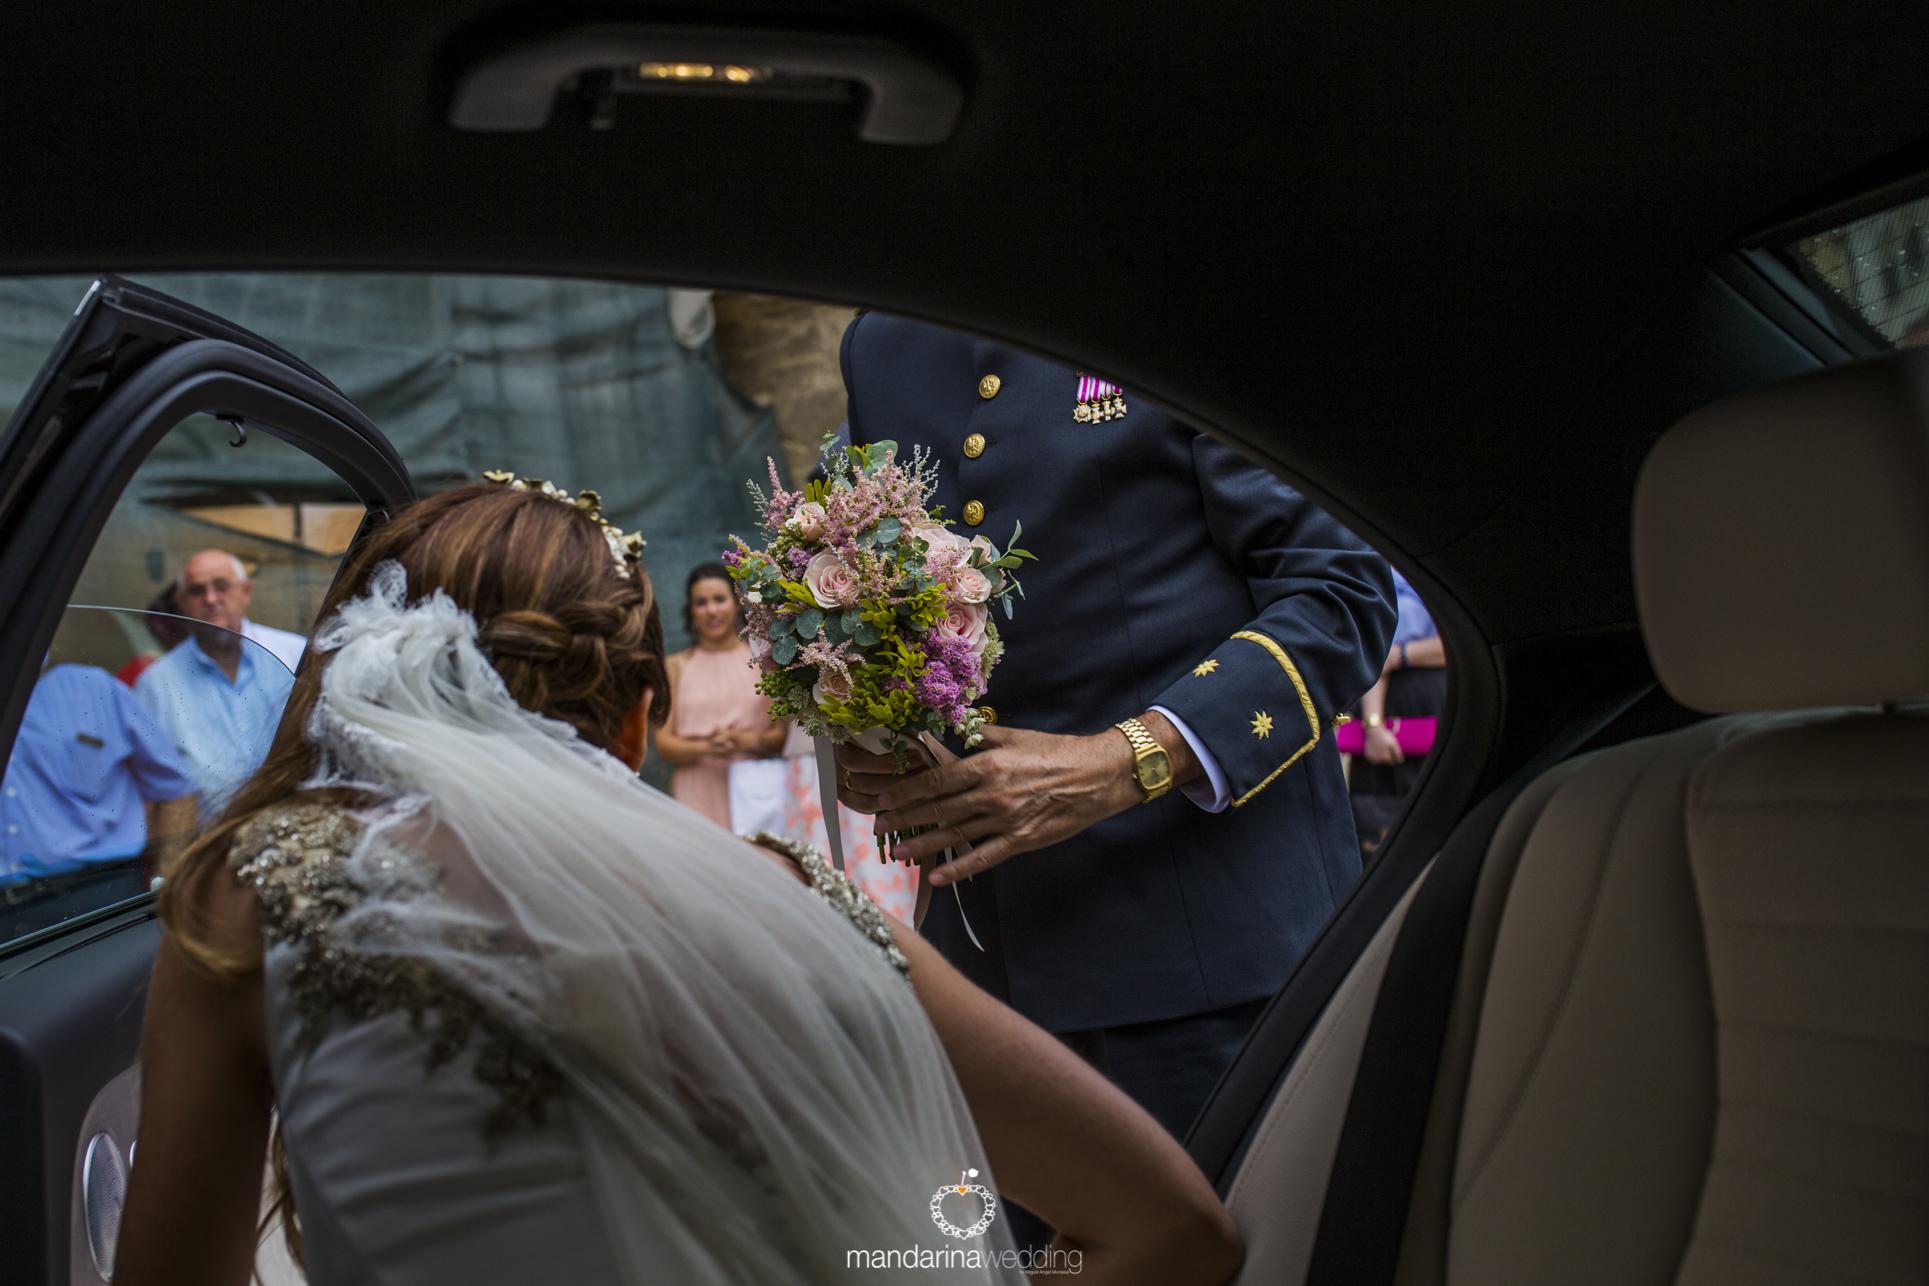 mandarina wedding, fotografo boda pais vasco, fotografo boda zaragoza, fotógrafo boda soria, fotografo boda Madrid, fotógrafo boda tarragona-09